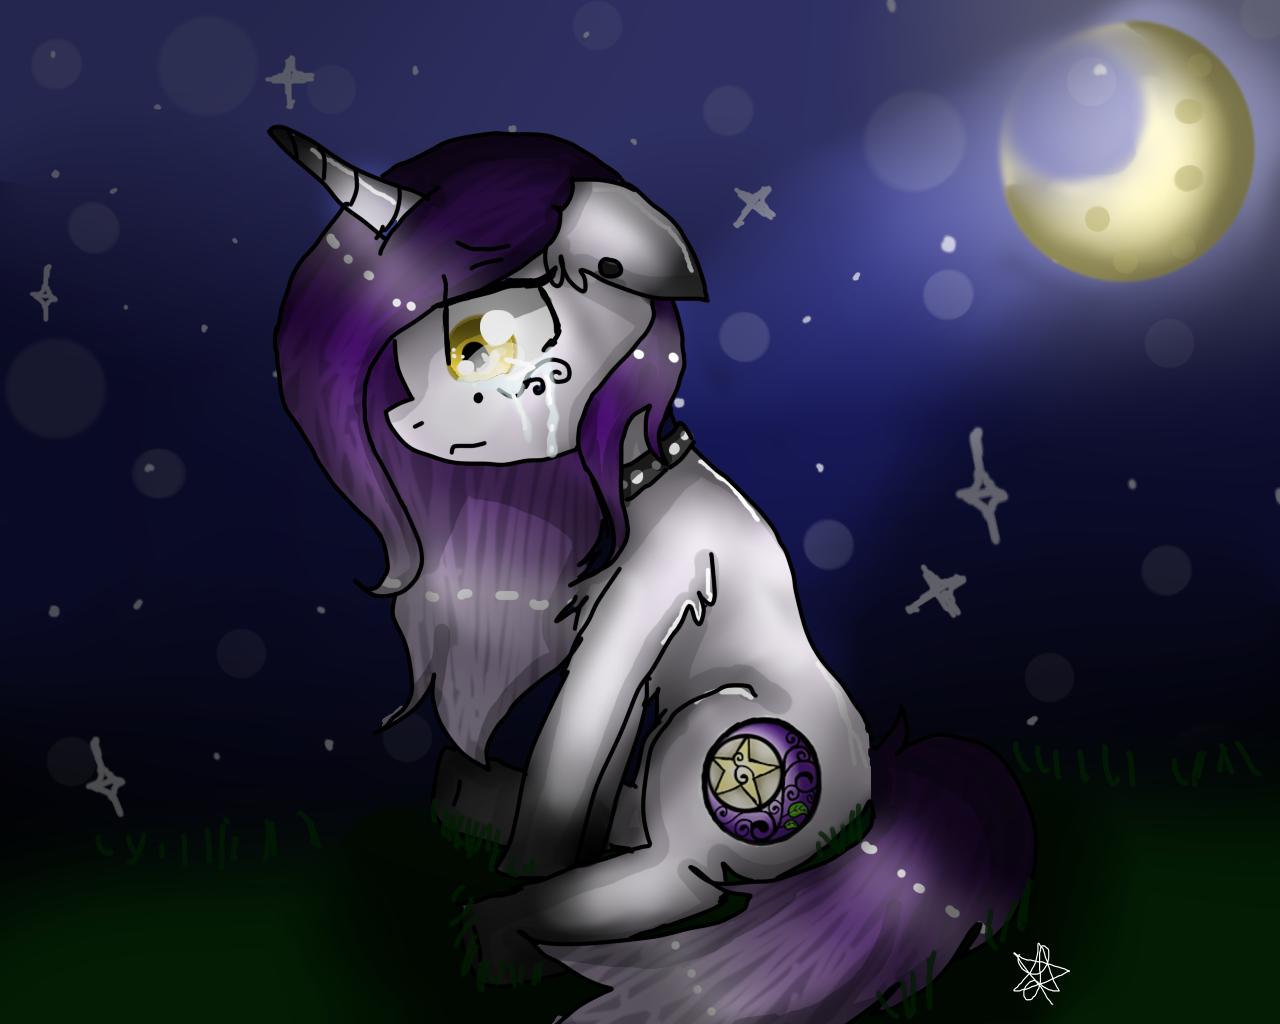 Moonlight clipart sad Sad Moonlight Moonlight  by